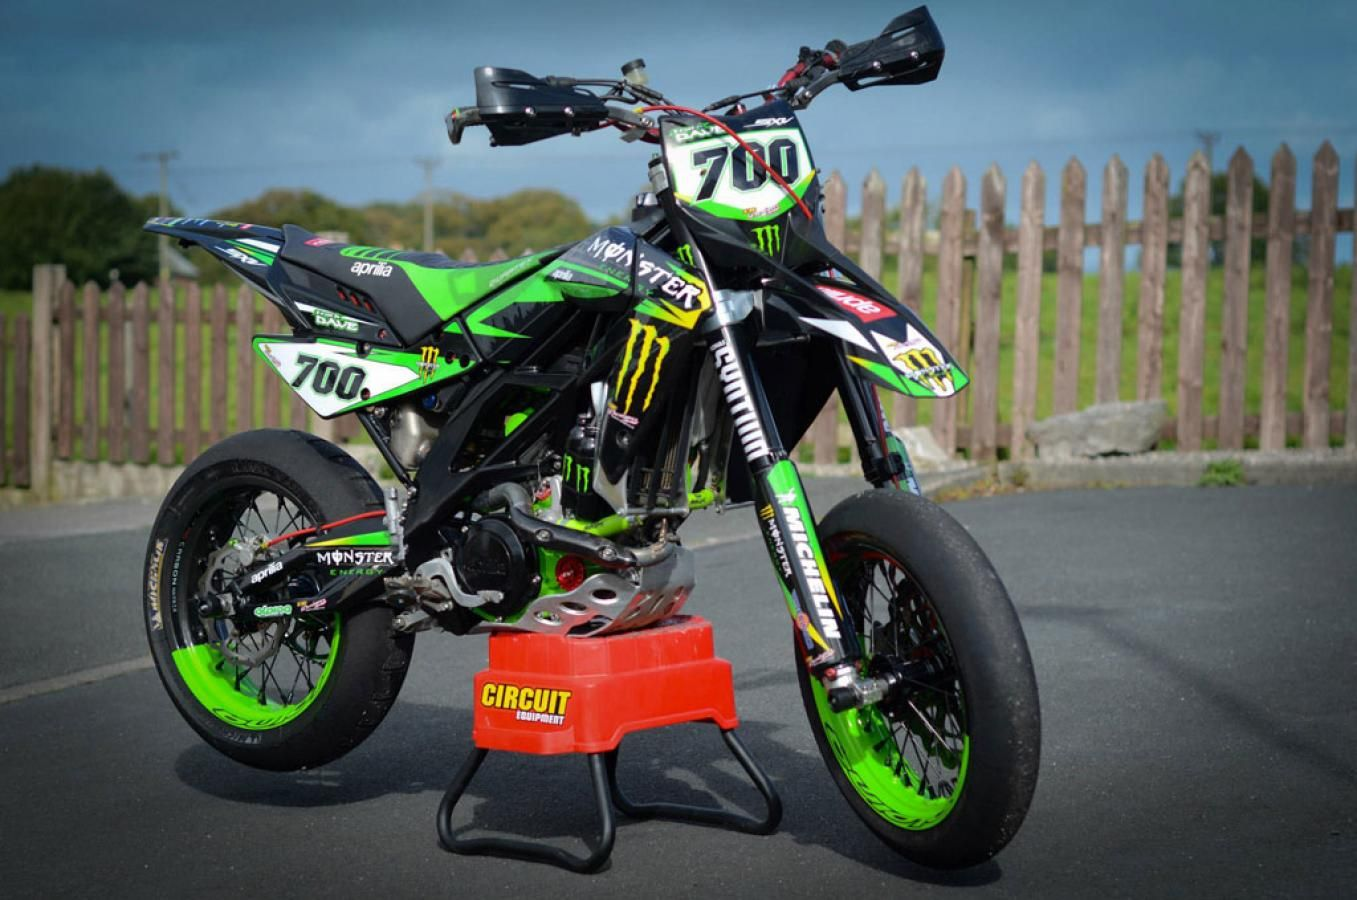 Aprilia motorcycles Supermotard, Moto cross, Motard